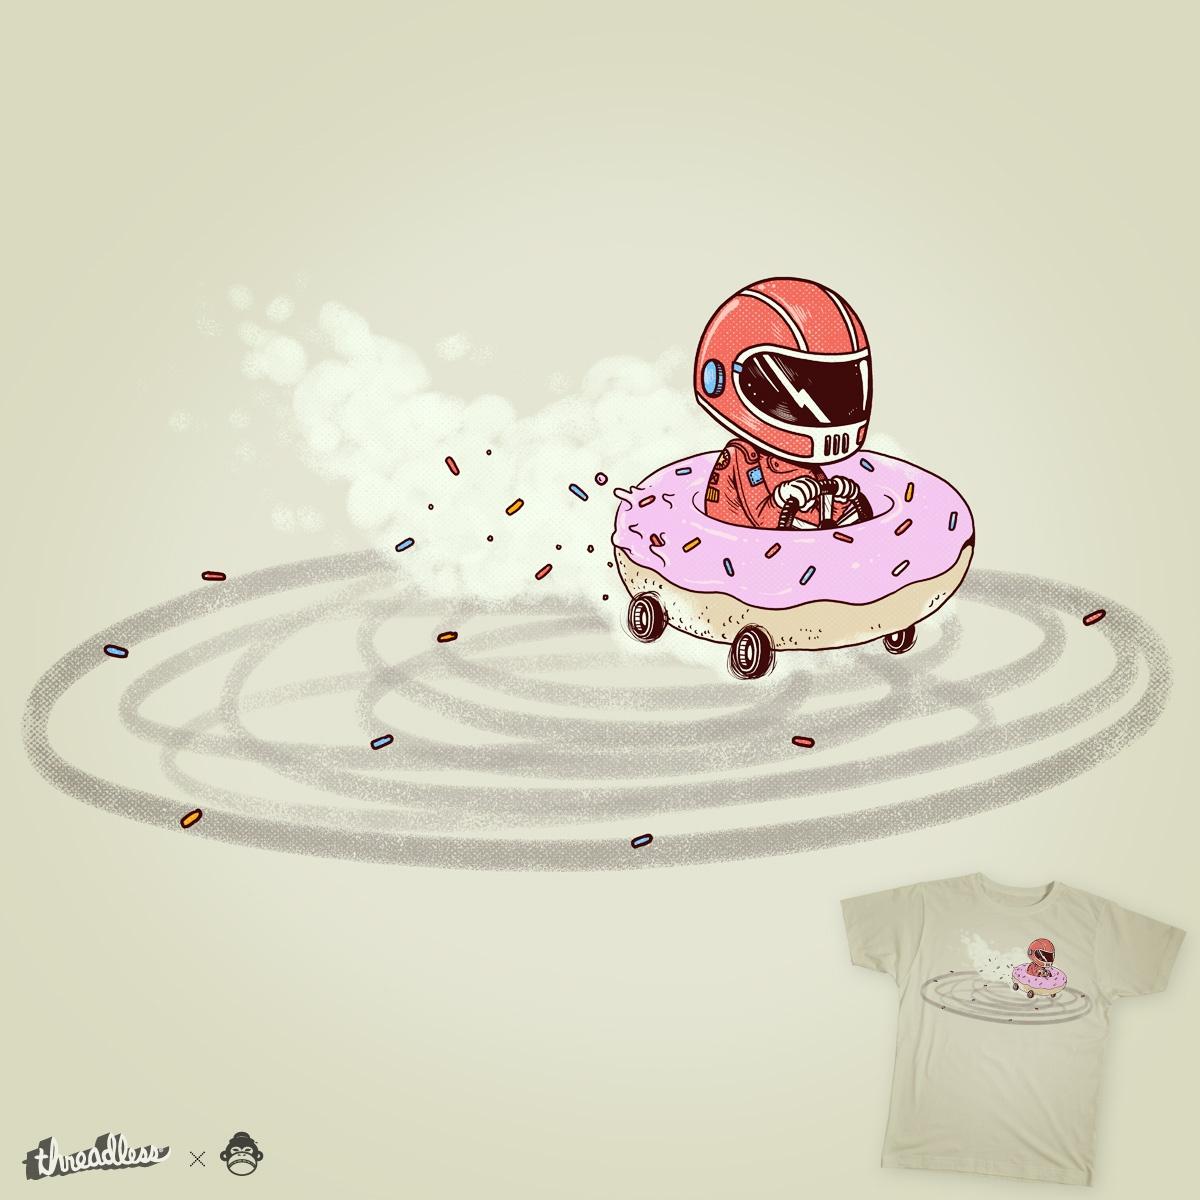 DONUTS by alexmdc on Threadless